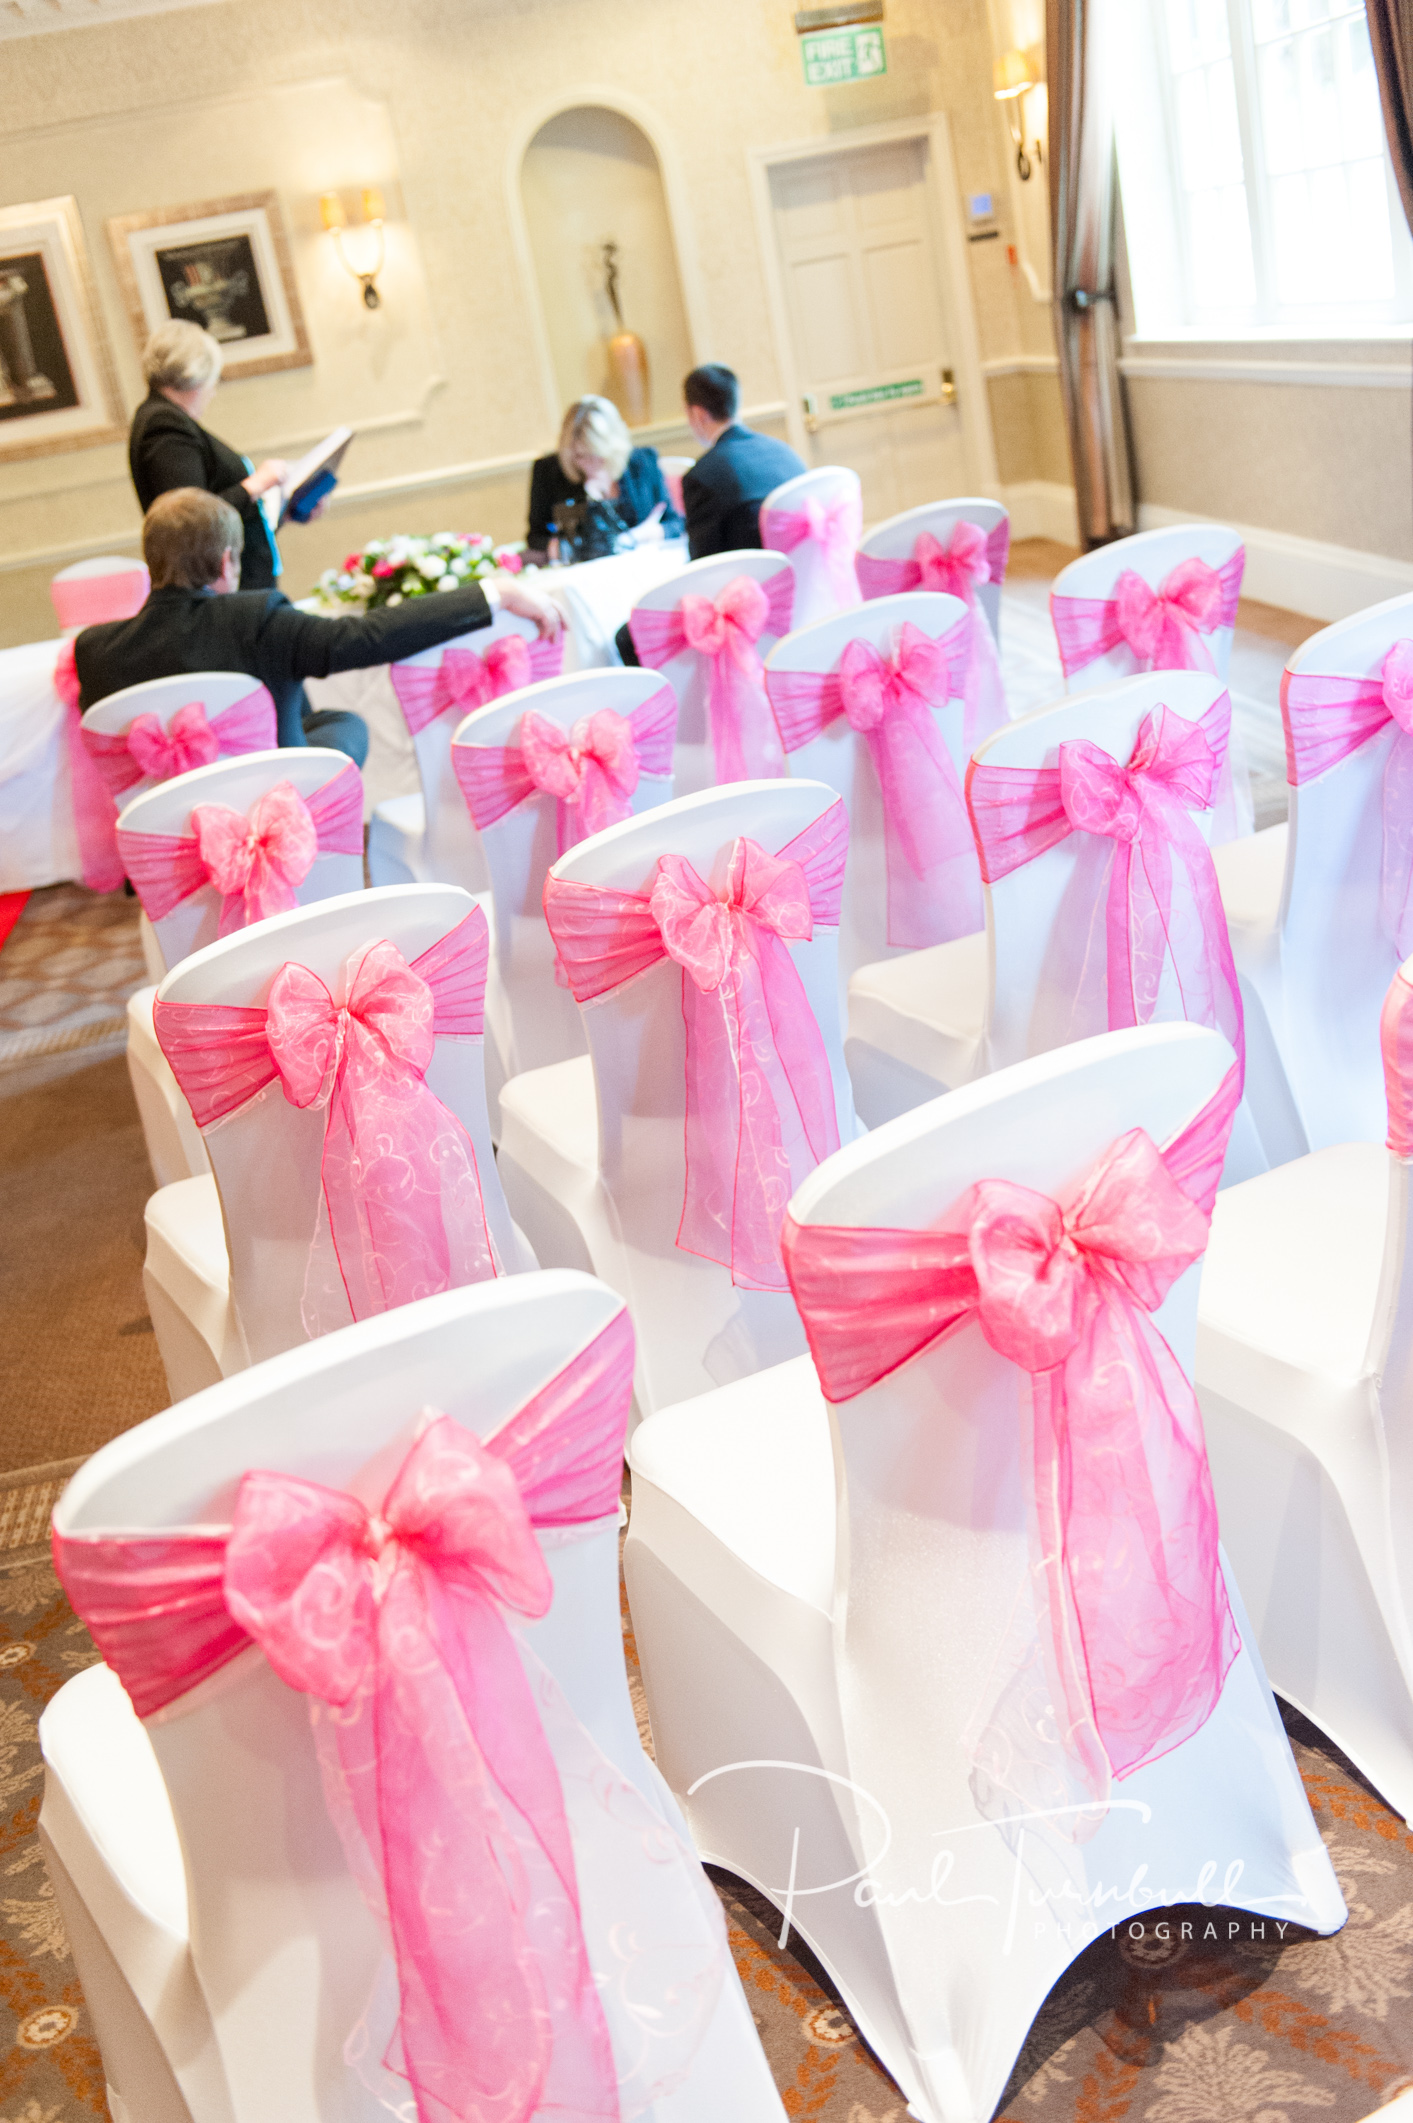 wedding-photography-wood-hall-wetherby-yorkshire-013.jpg